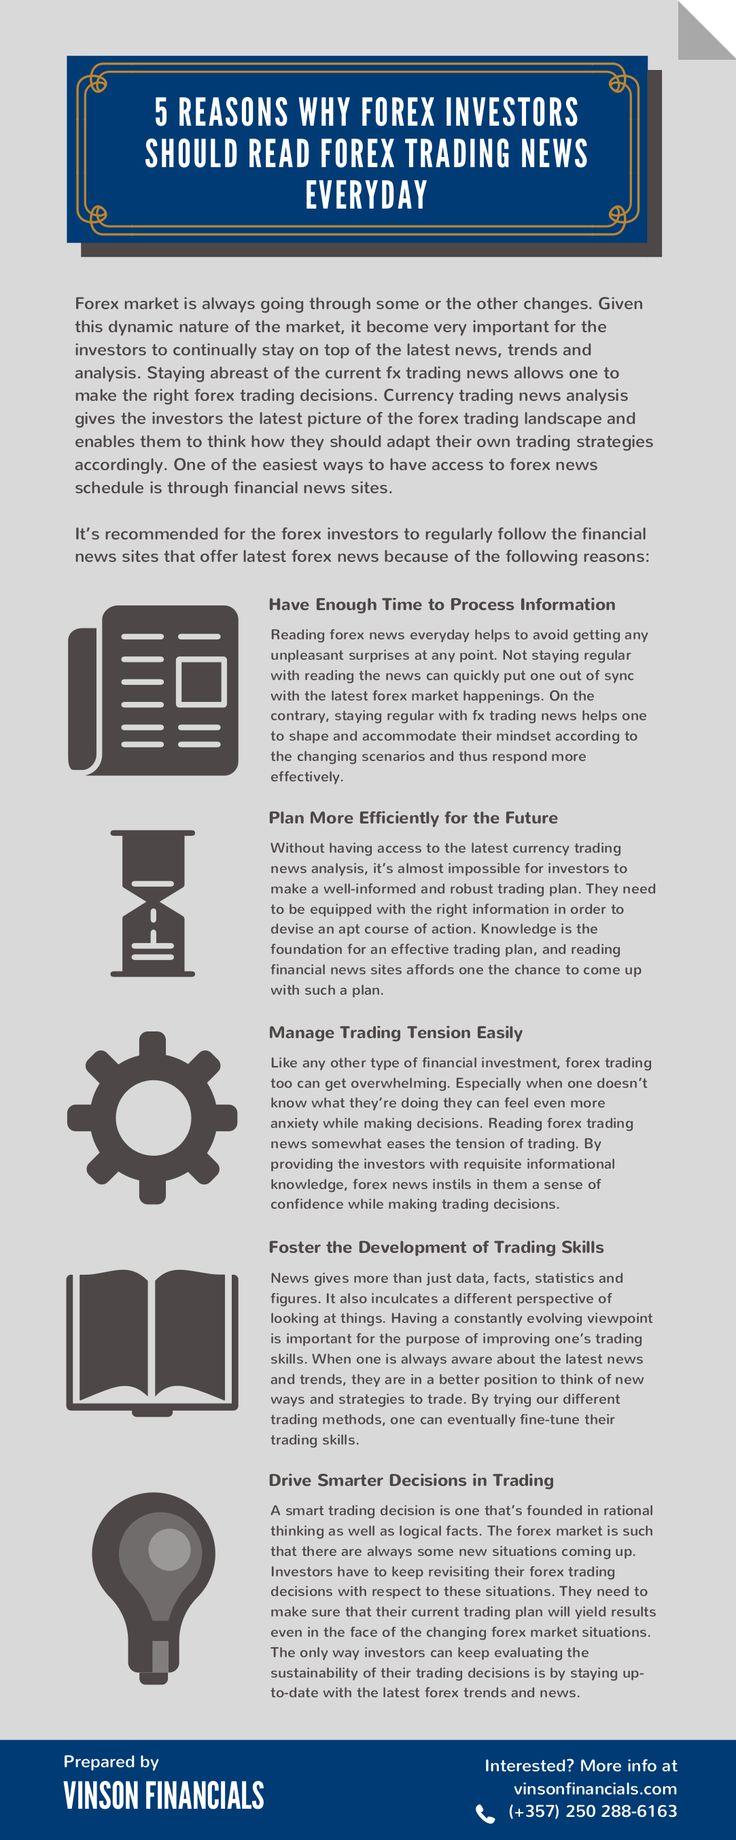 Intraday trading strategies jeff cooper pdf